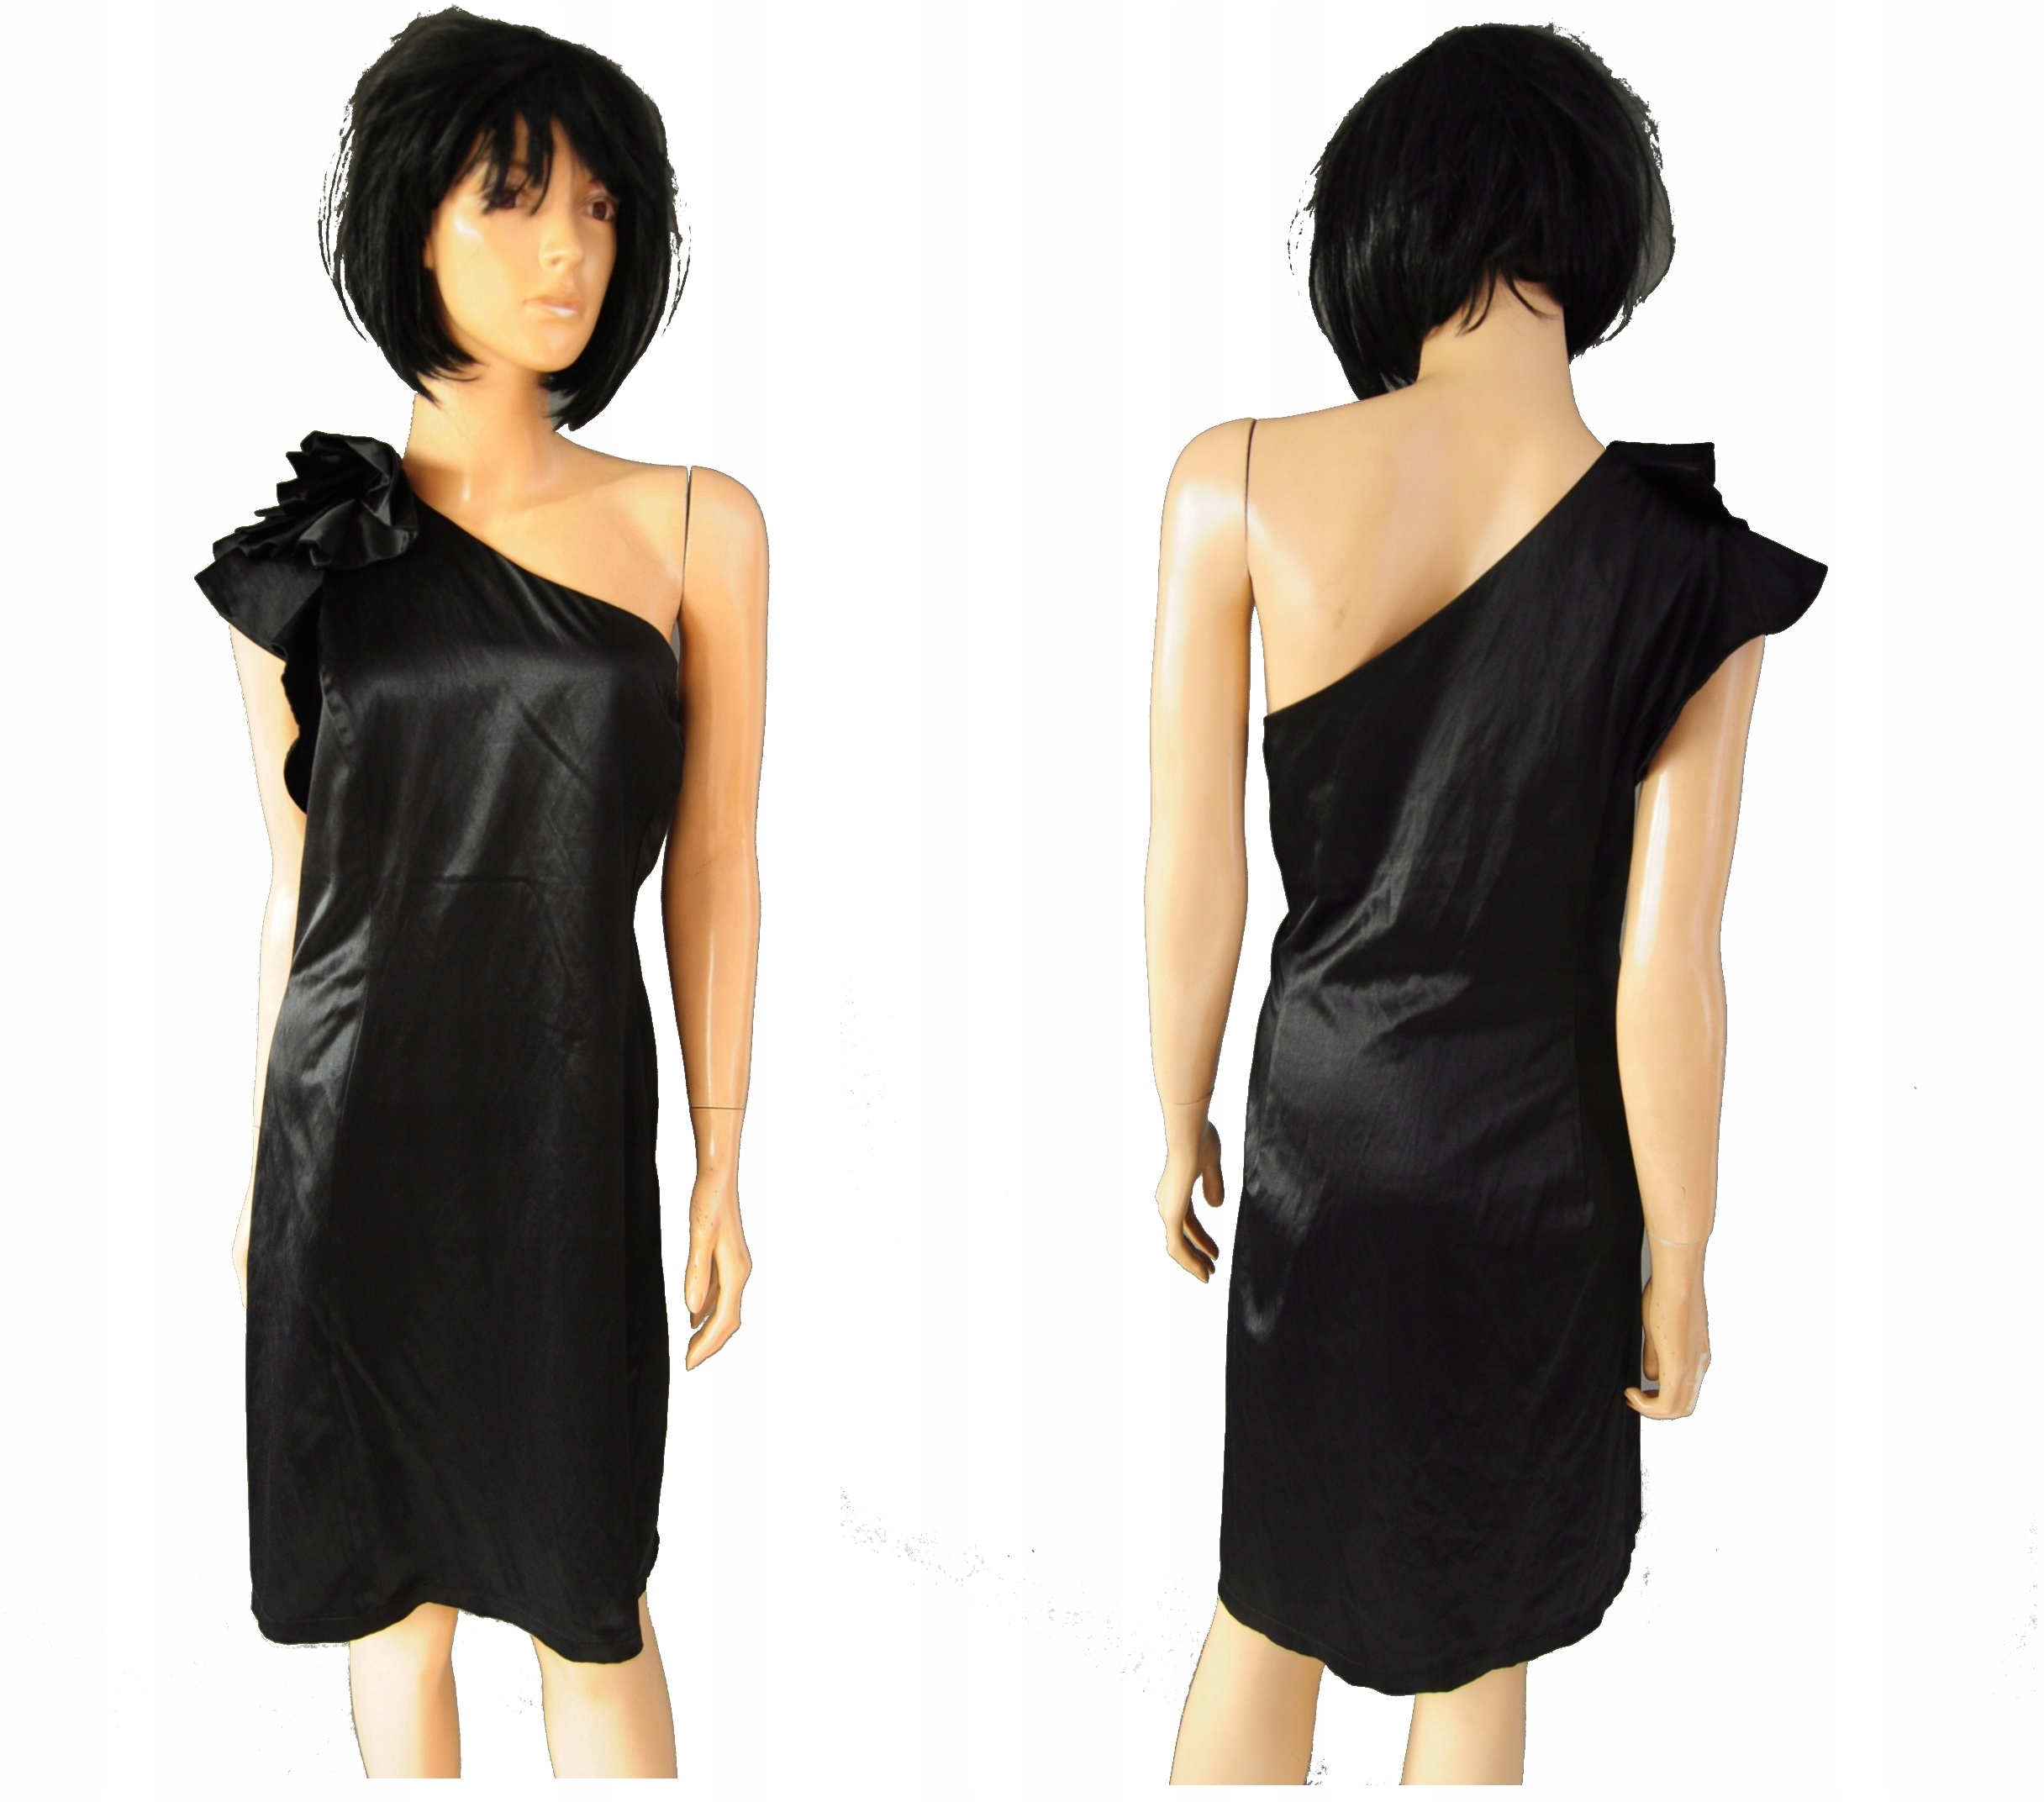 ec0a71e0e5 Red Herring sukienka czarna koktajlowa 46 - 7680427649 - oficjalne ...